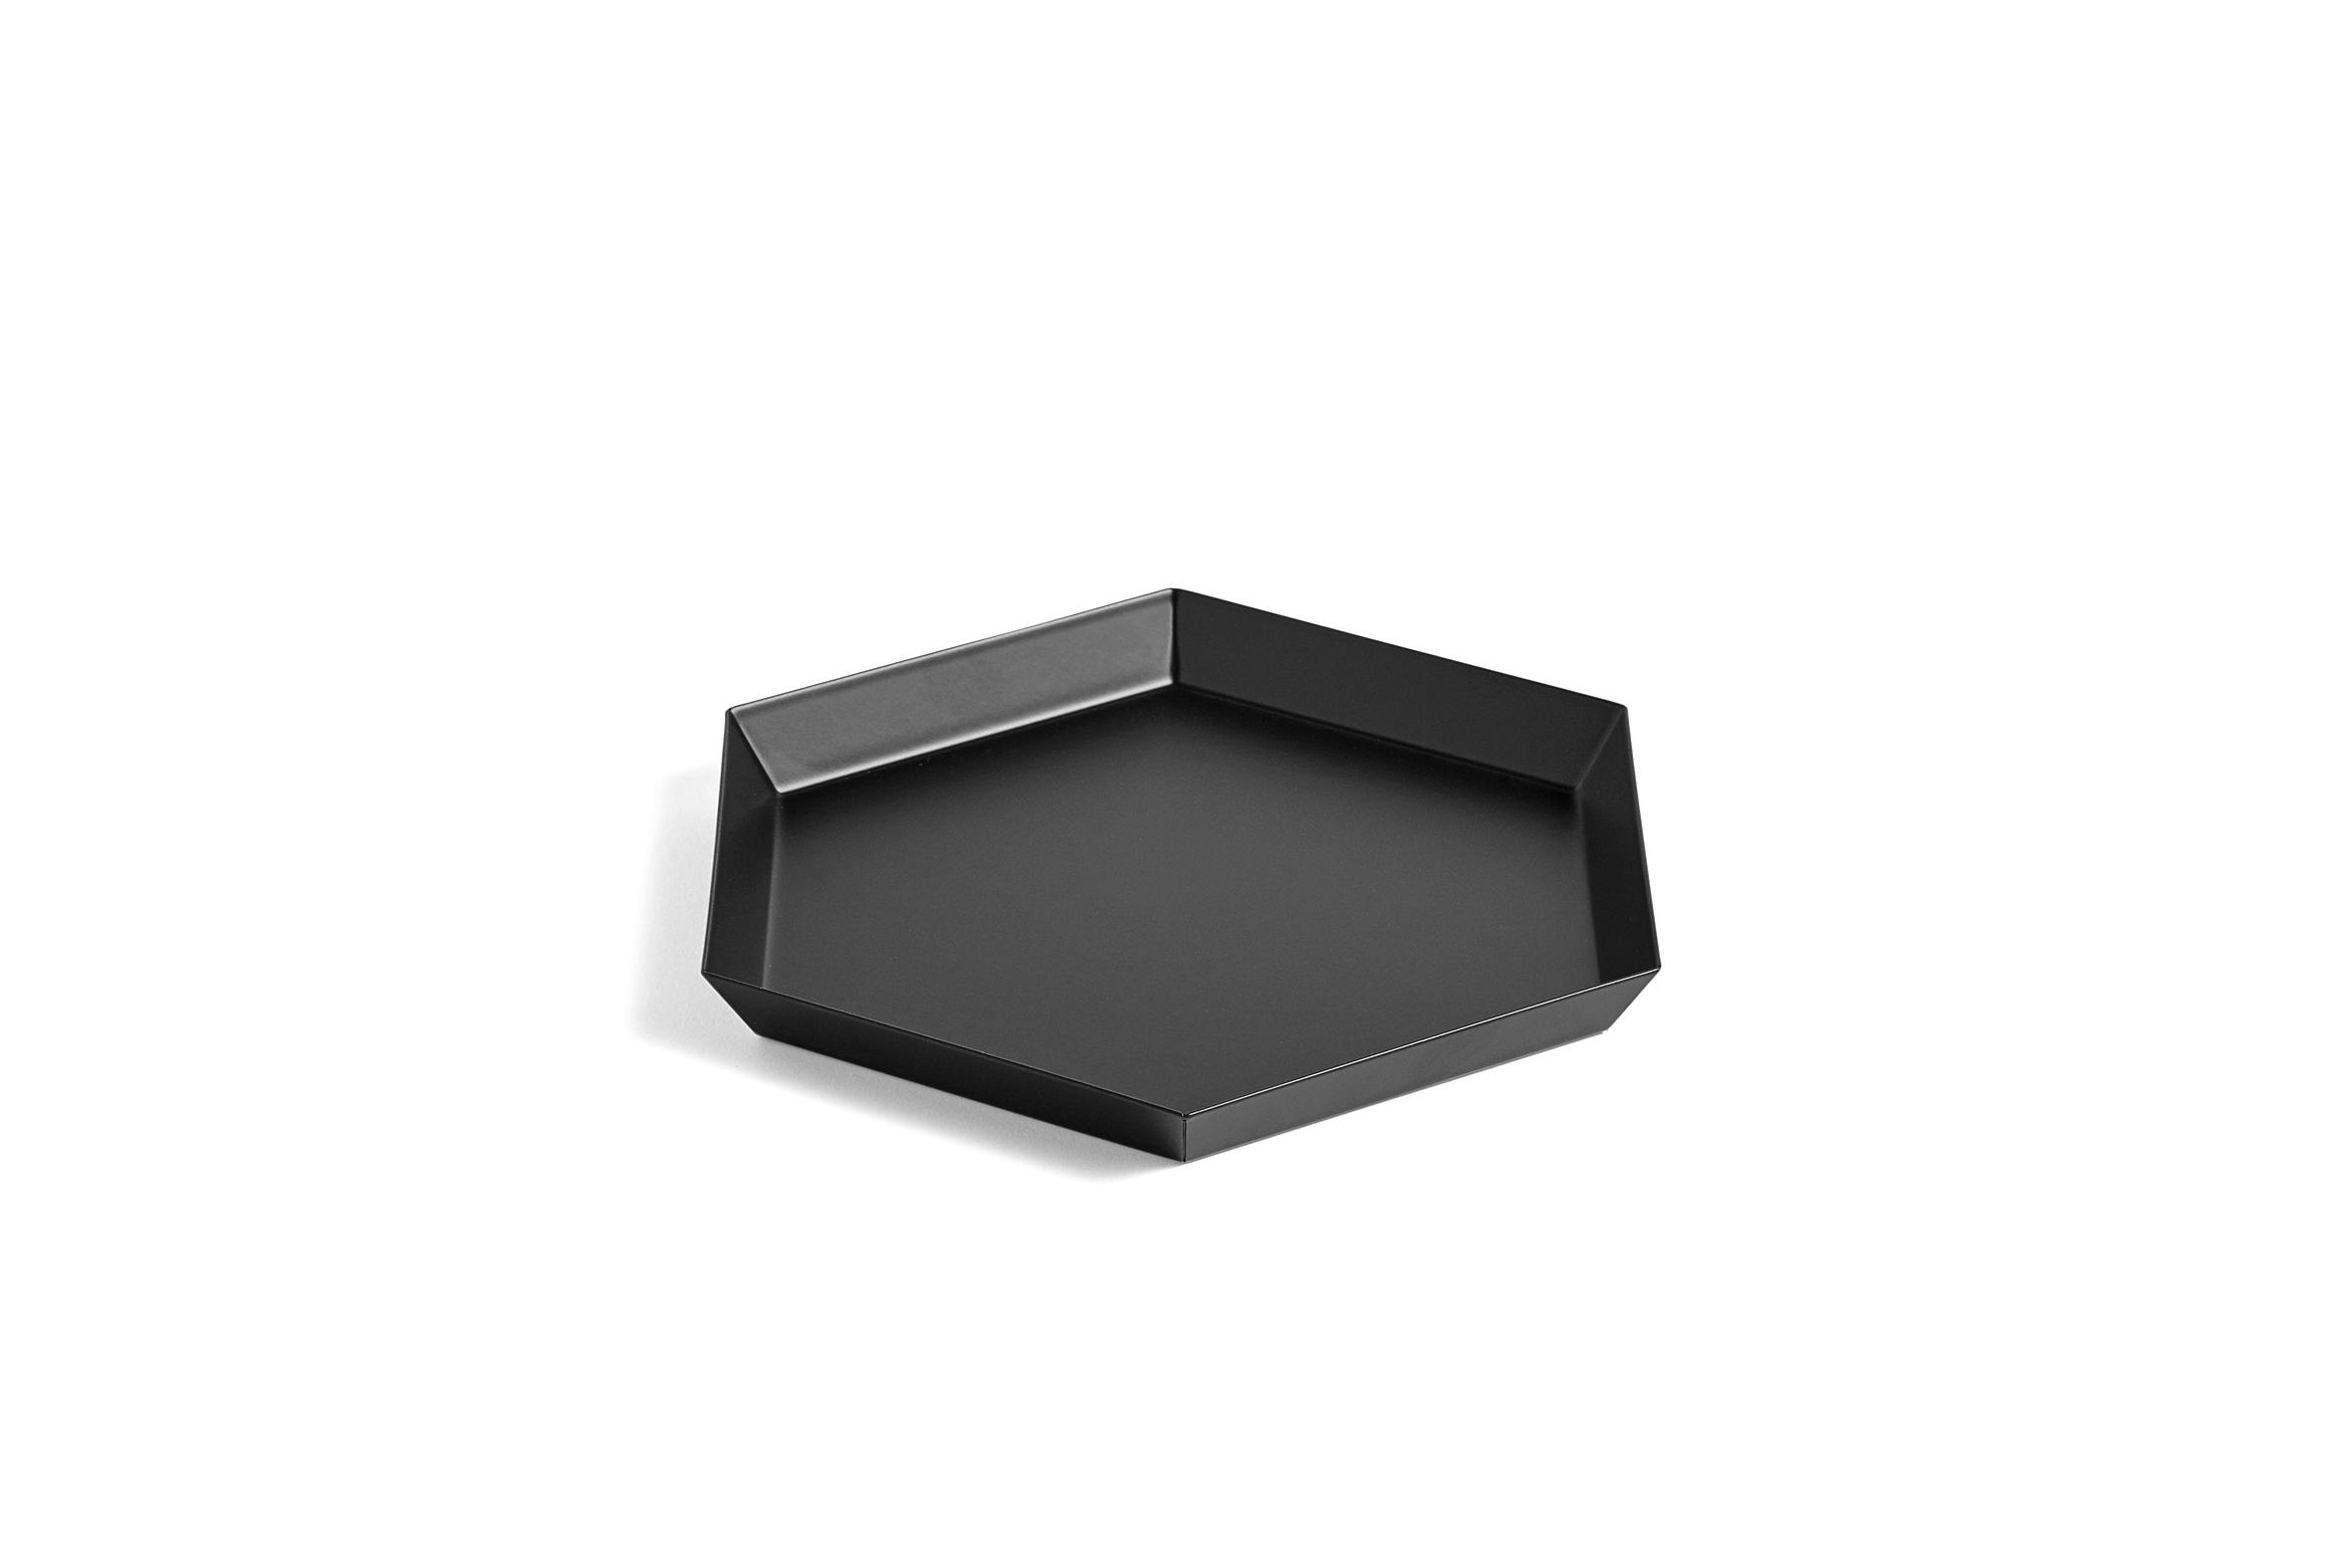 HAY - Kaleido Tray Small - Black (503931)